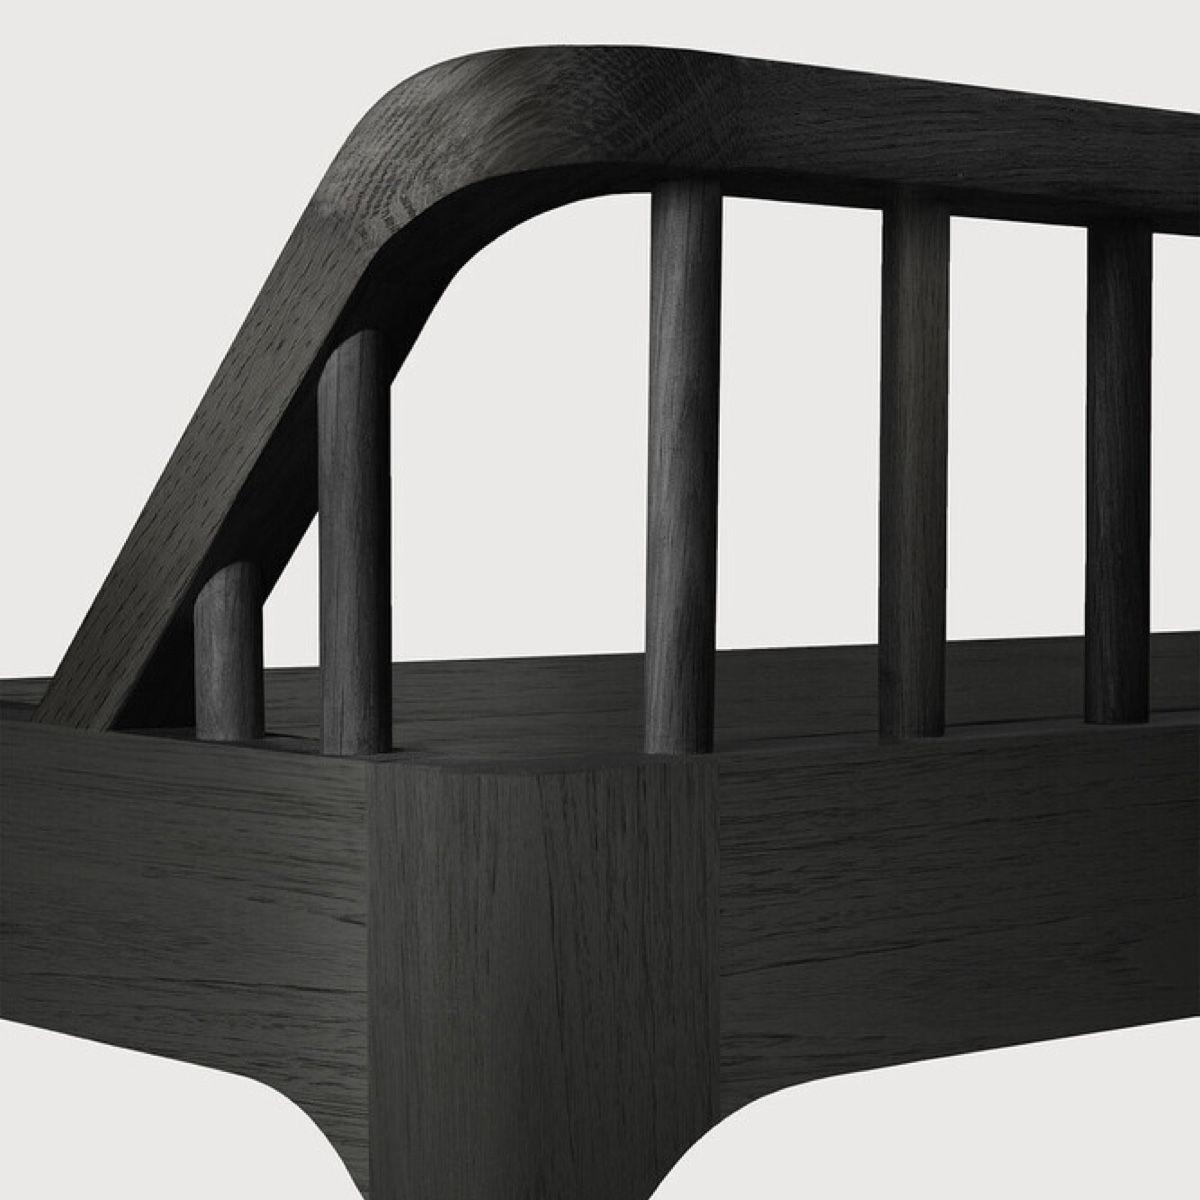 Ethnicraft Oak Spindle Bench